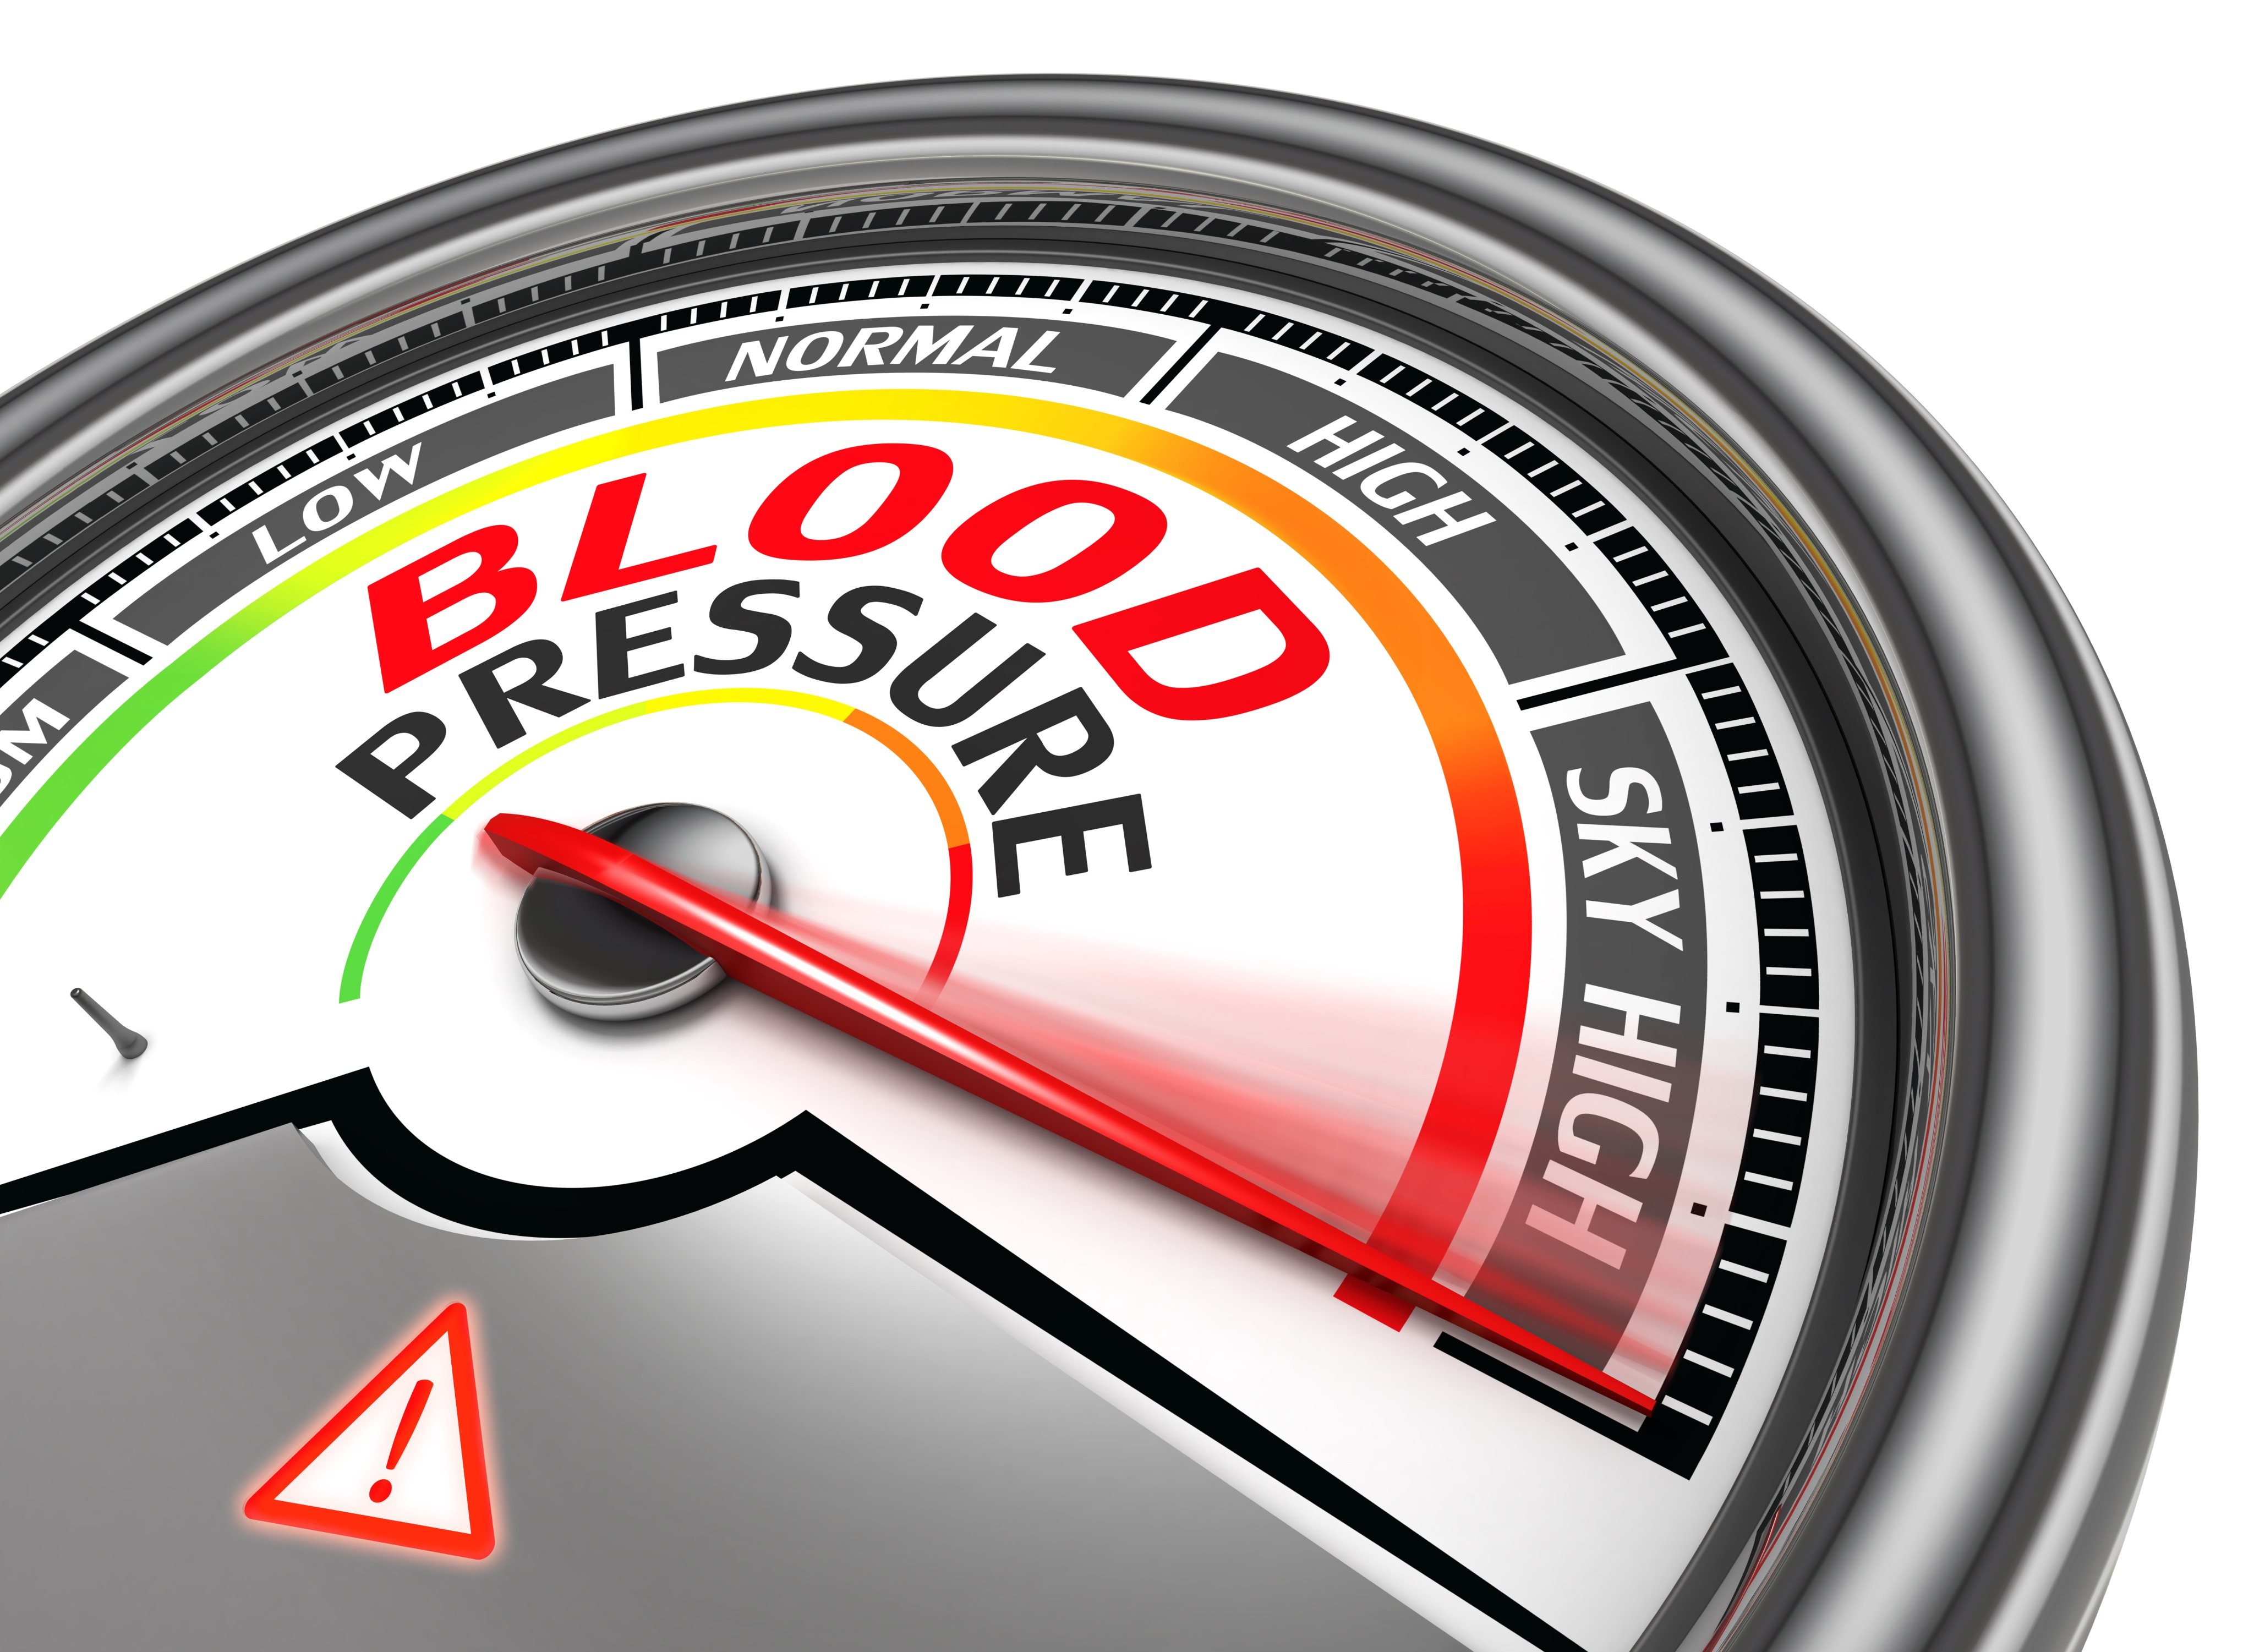 magas vérnyomás қazaқsha